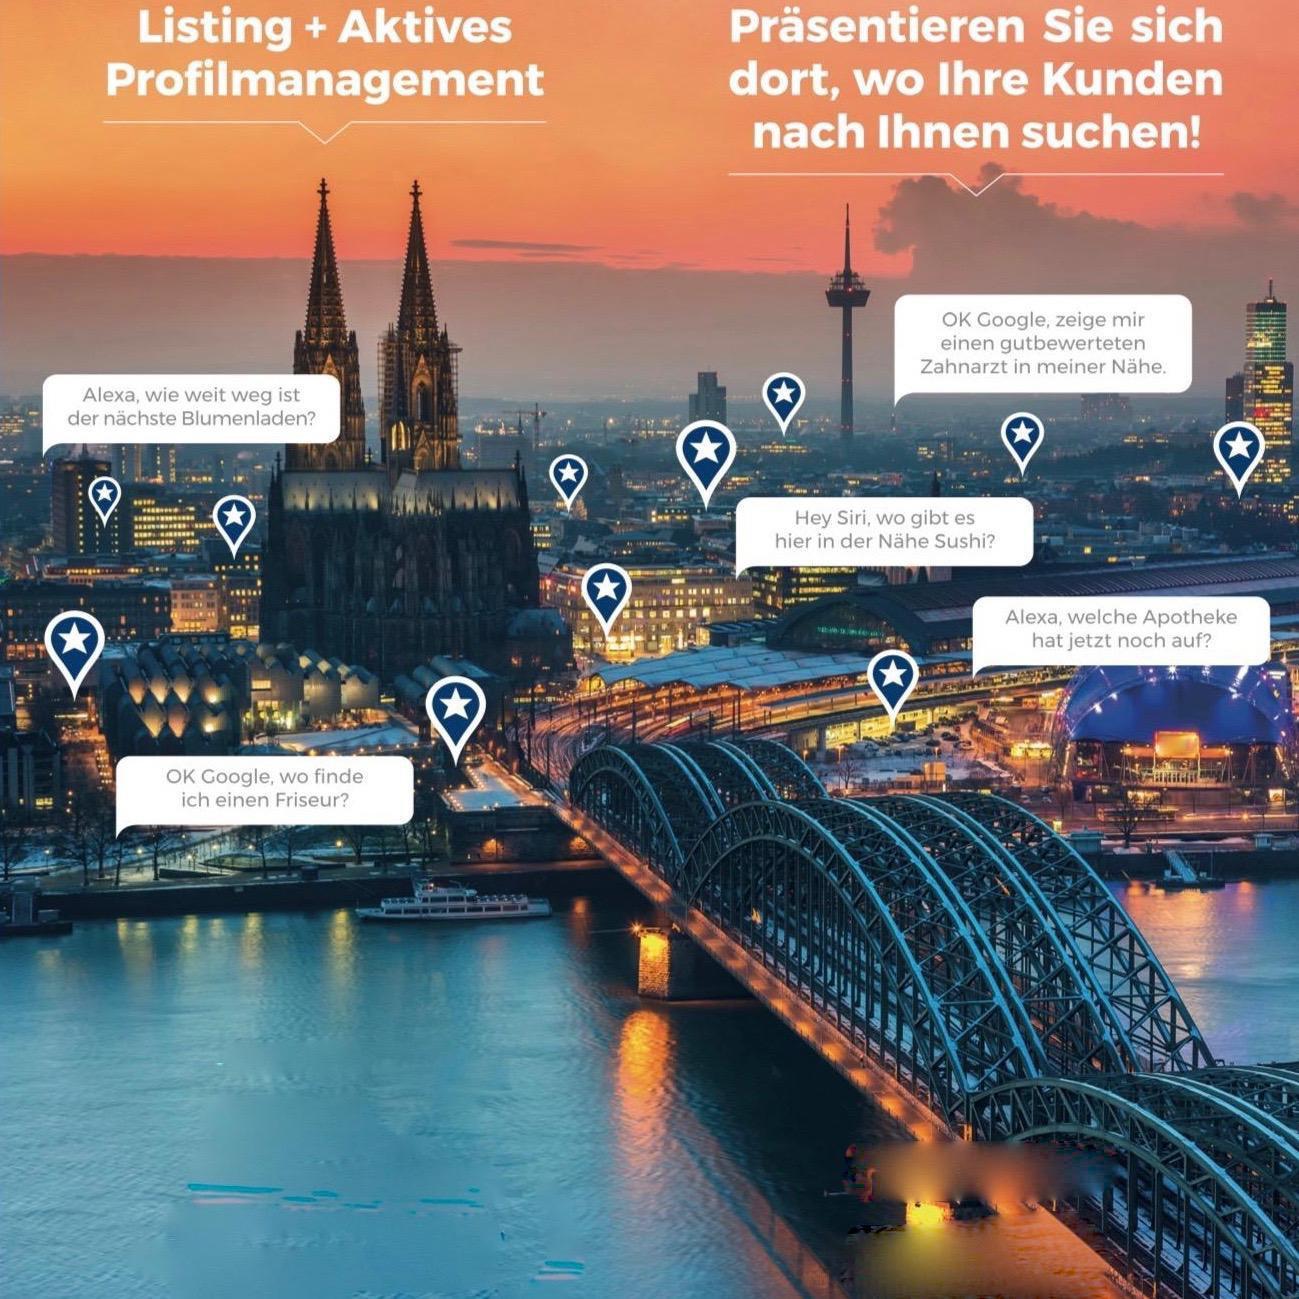 Bild zu Online Marketing Köln Gastfreundschaft I Local Seo I Webdesign I Digitalisierung in Köln